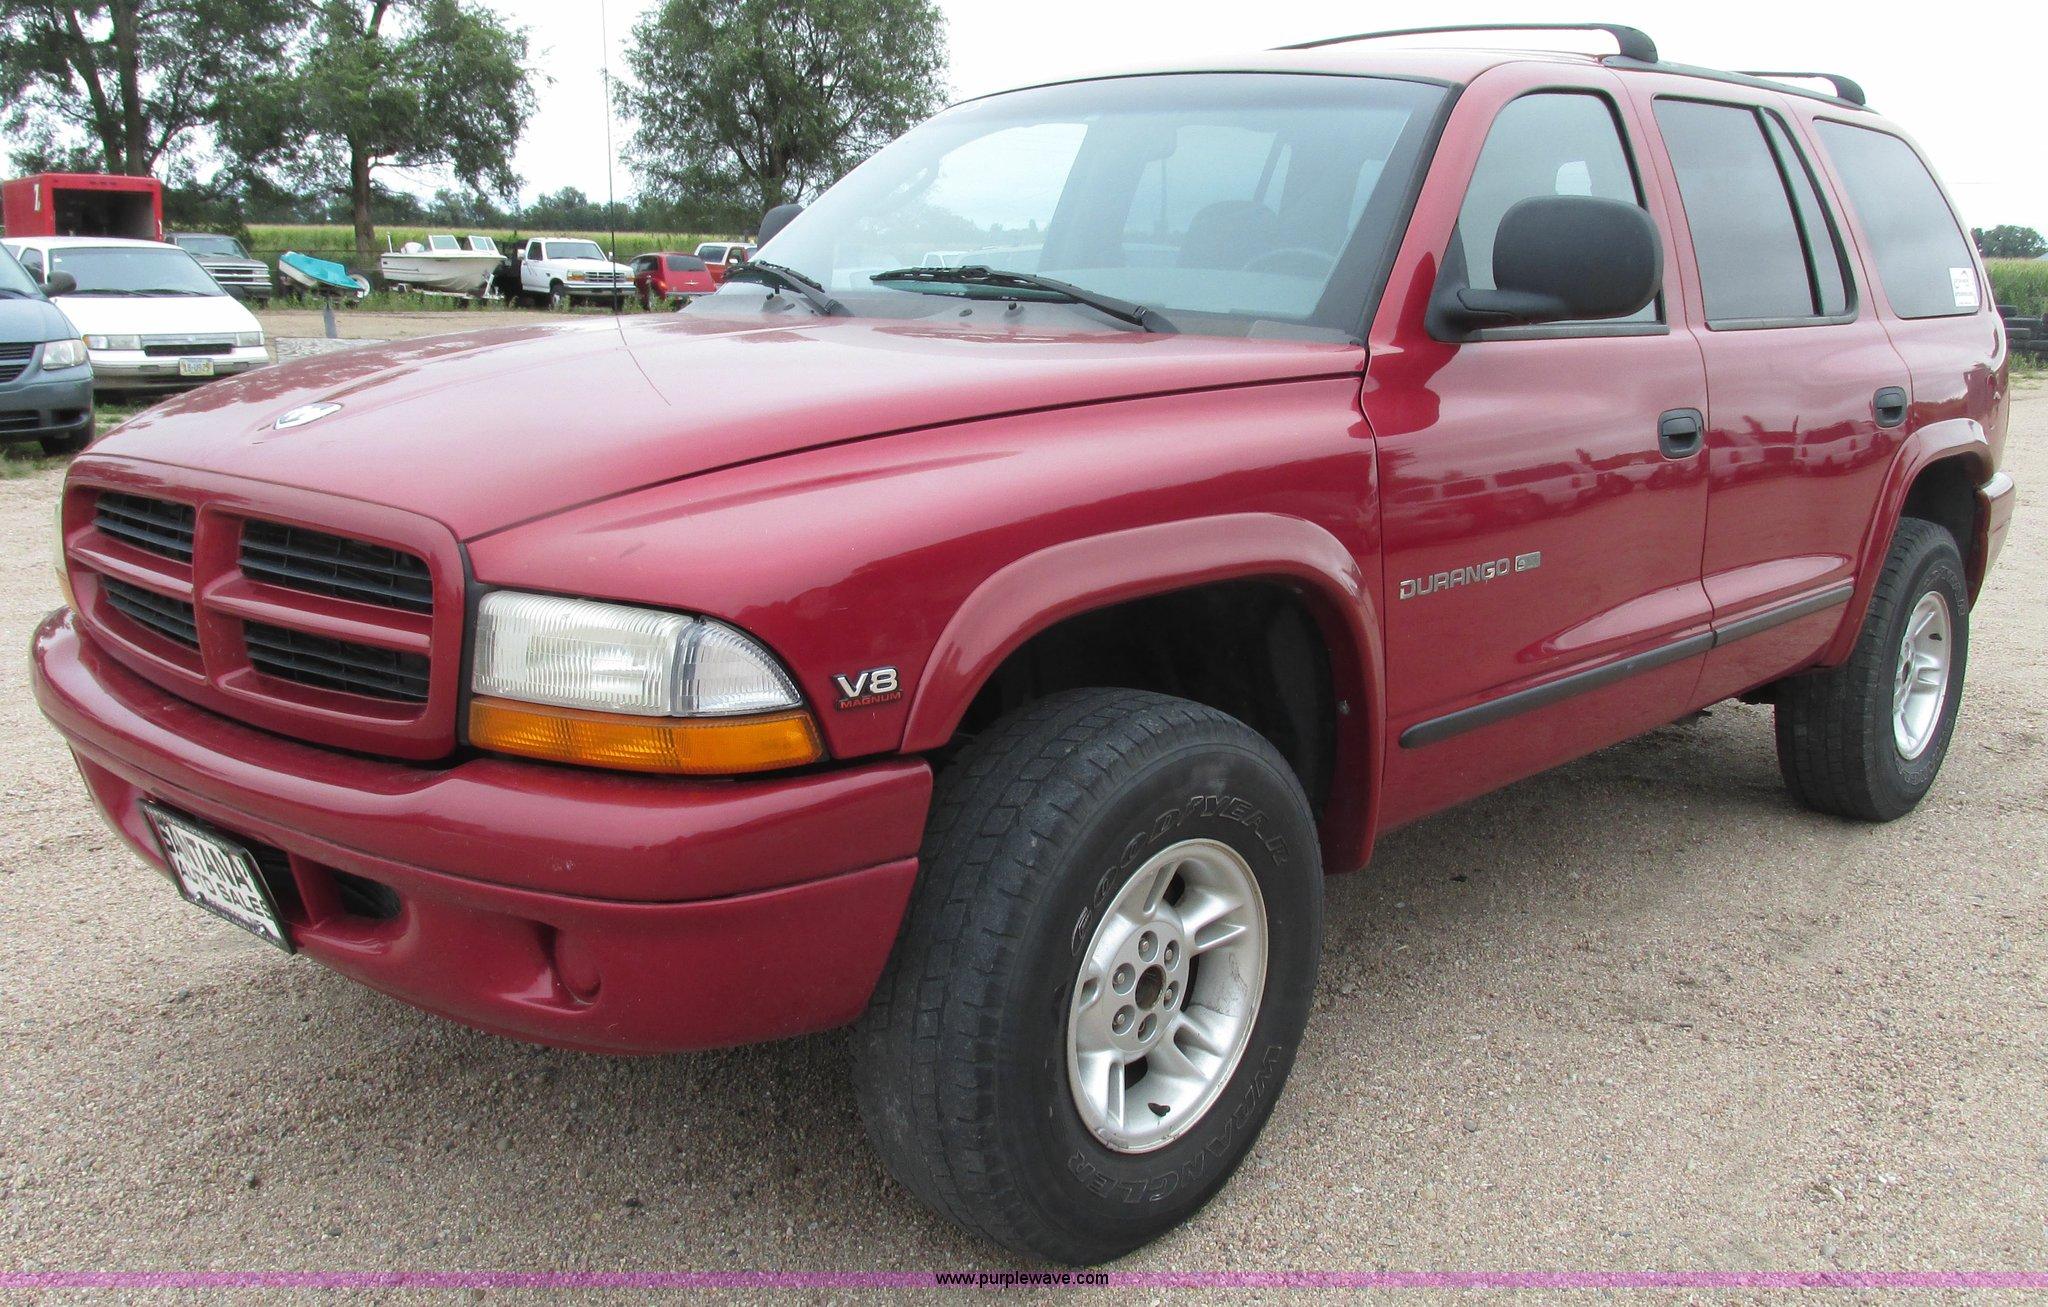 1999 Dodge Durango Slt Suv In Lexington Ne Item G9970 Sold Purple Wave